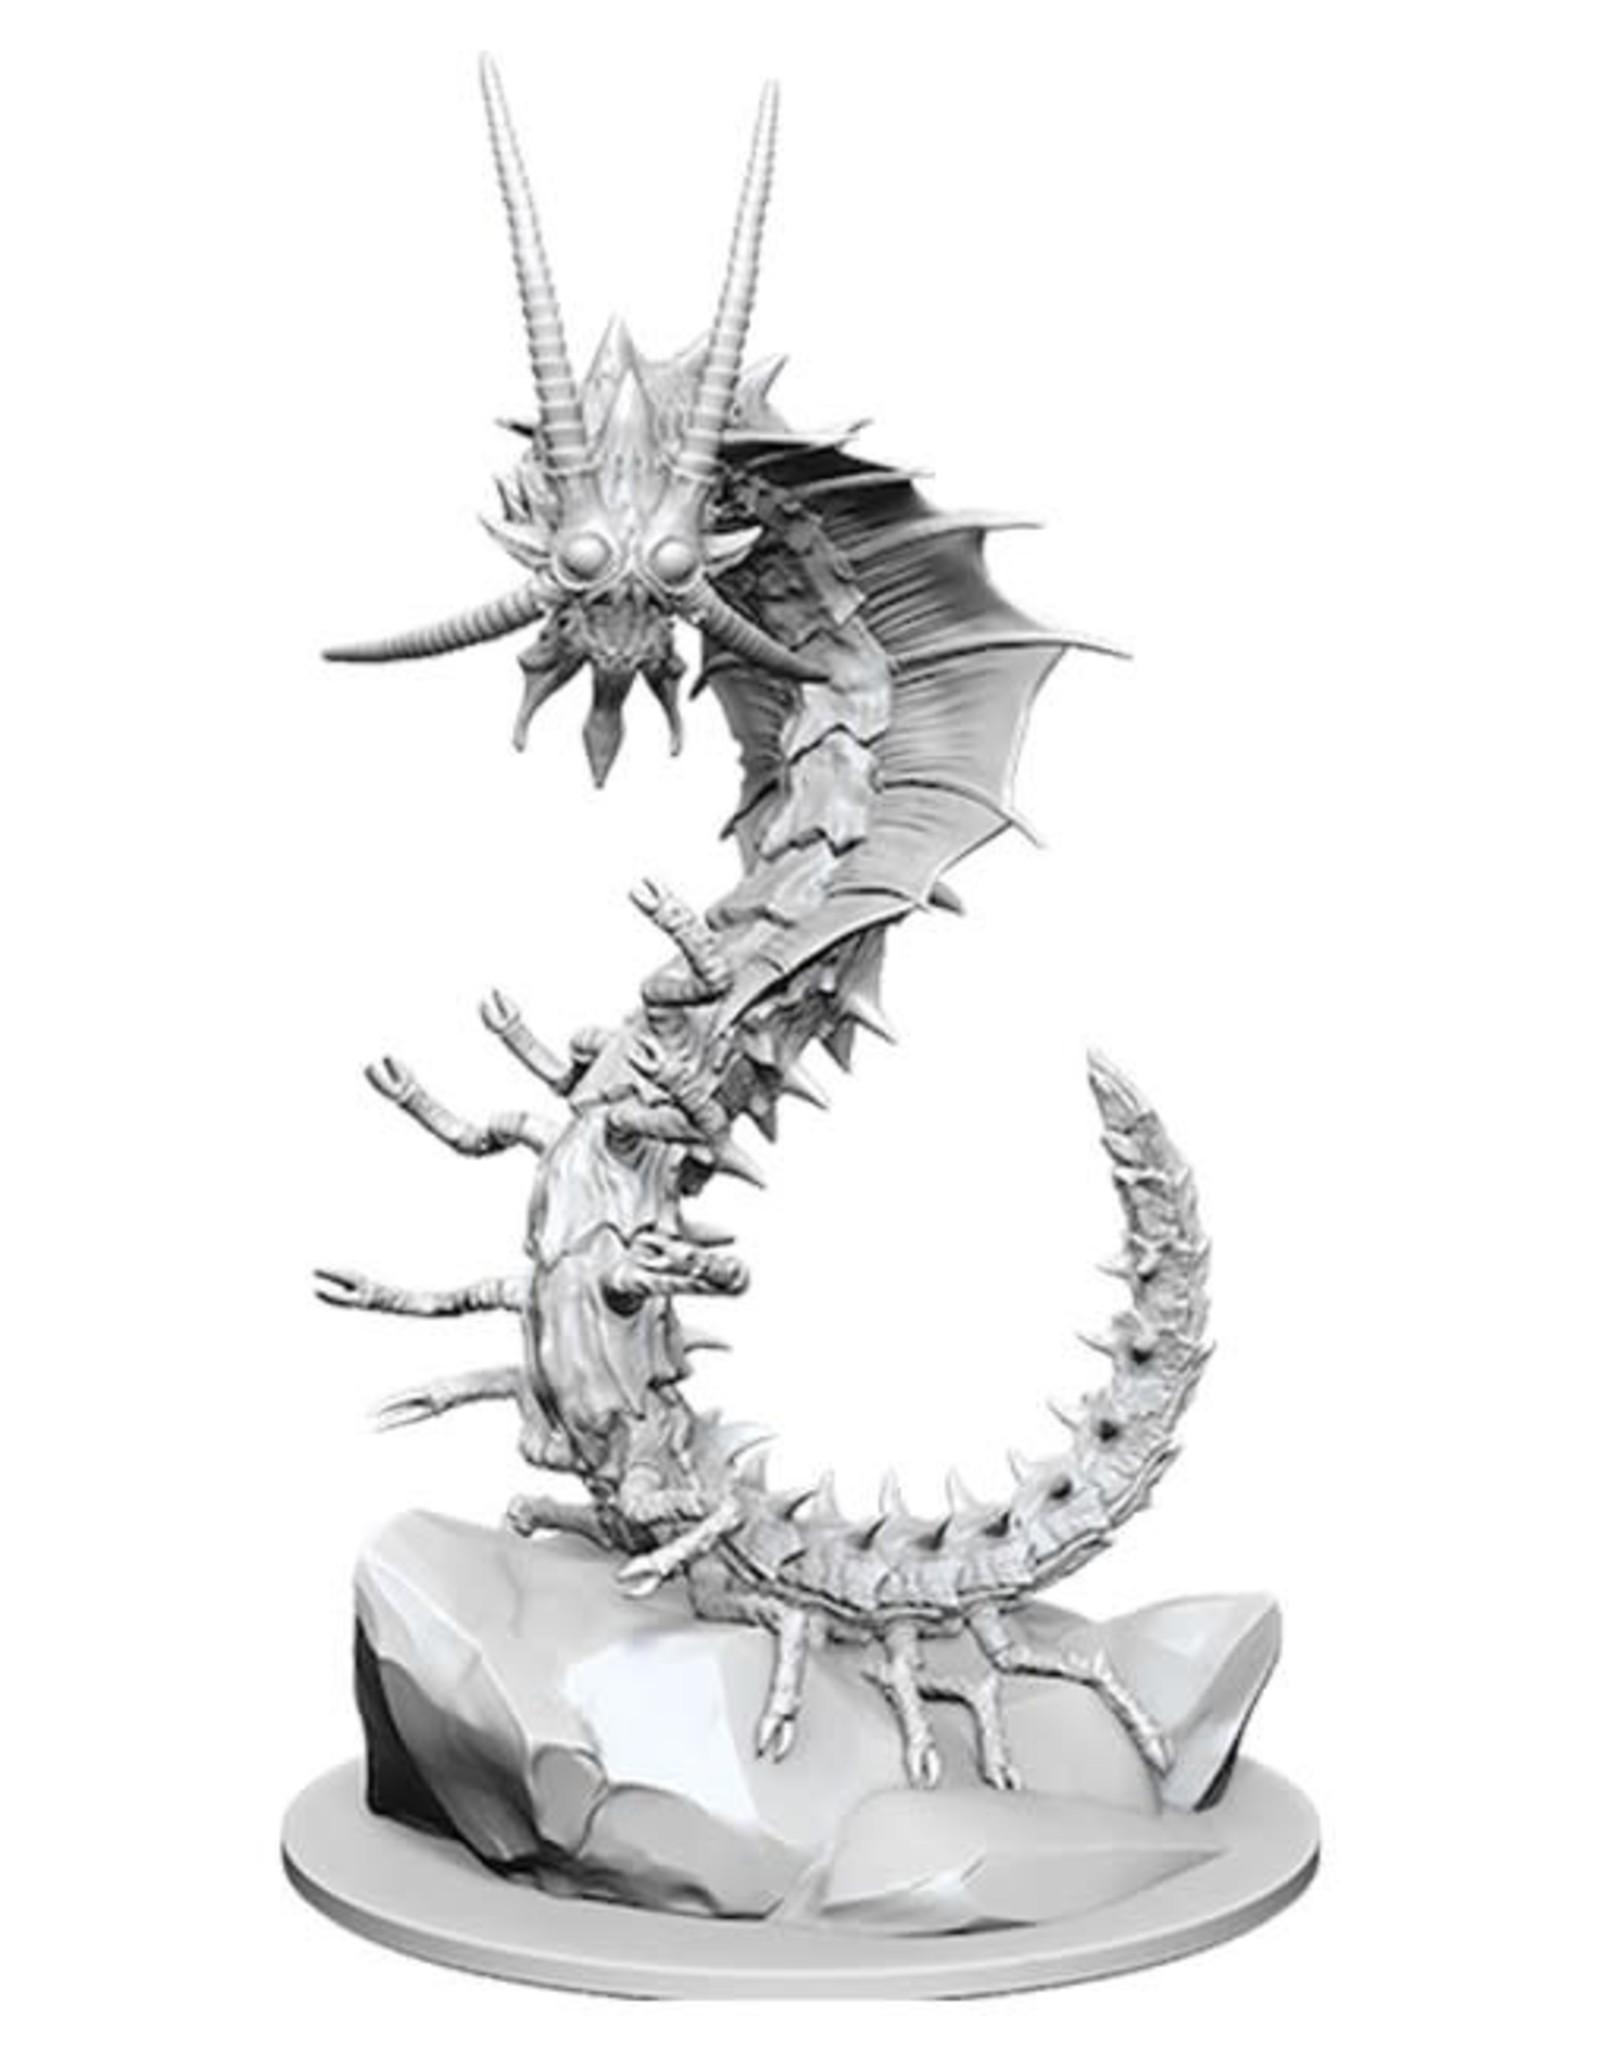 WizKids Dungeons & Dragons Nolzur's Marvelous Miniatures: Adult Remorhaz